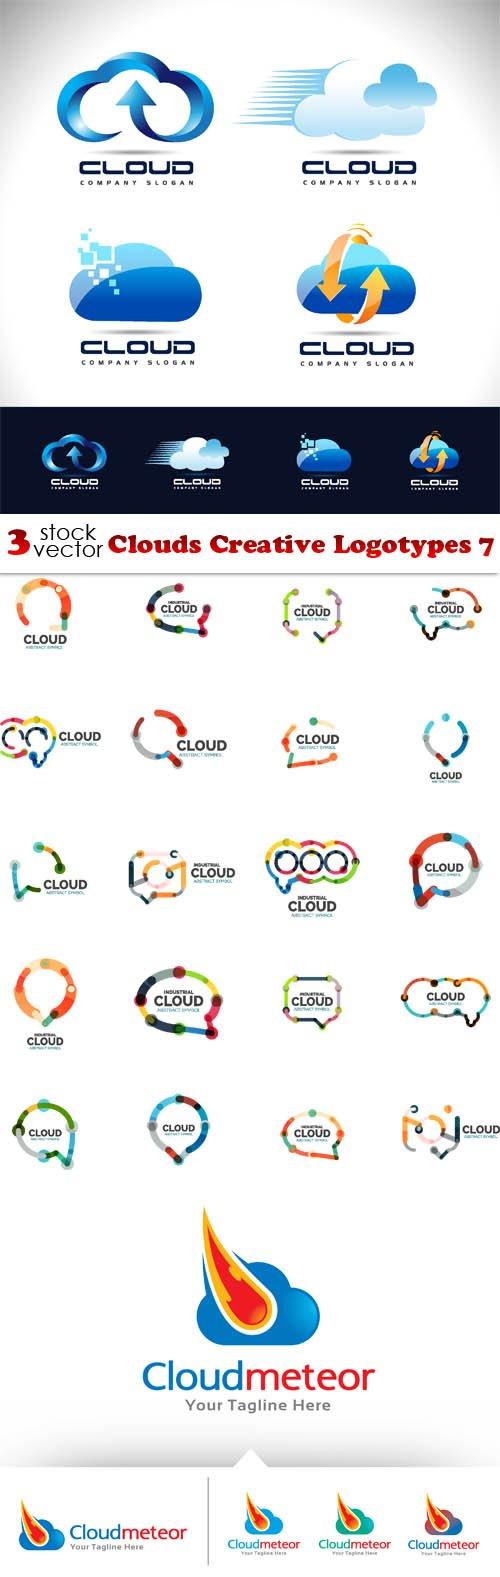 Vectors - Clouds Creative Logotypes 7